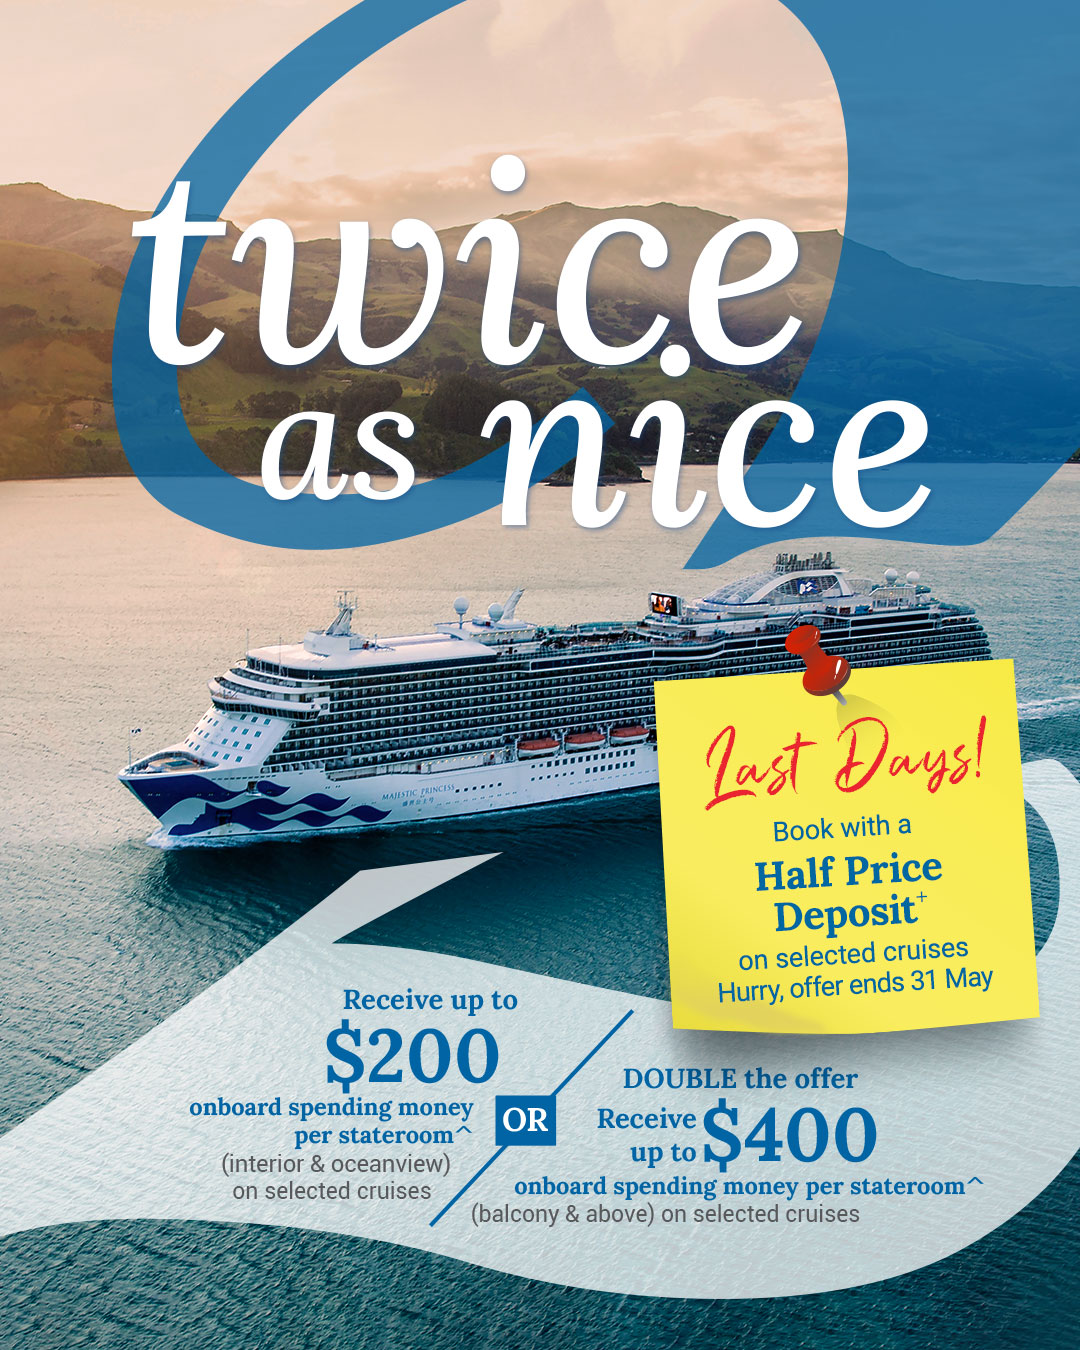 Princess Cruises Twice as Nice Plus reduced deposit offer